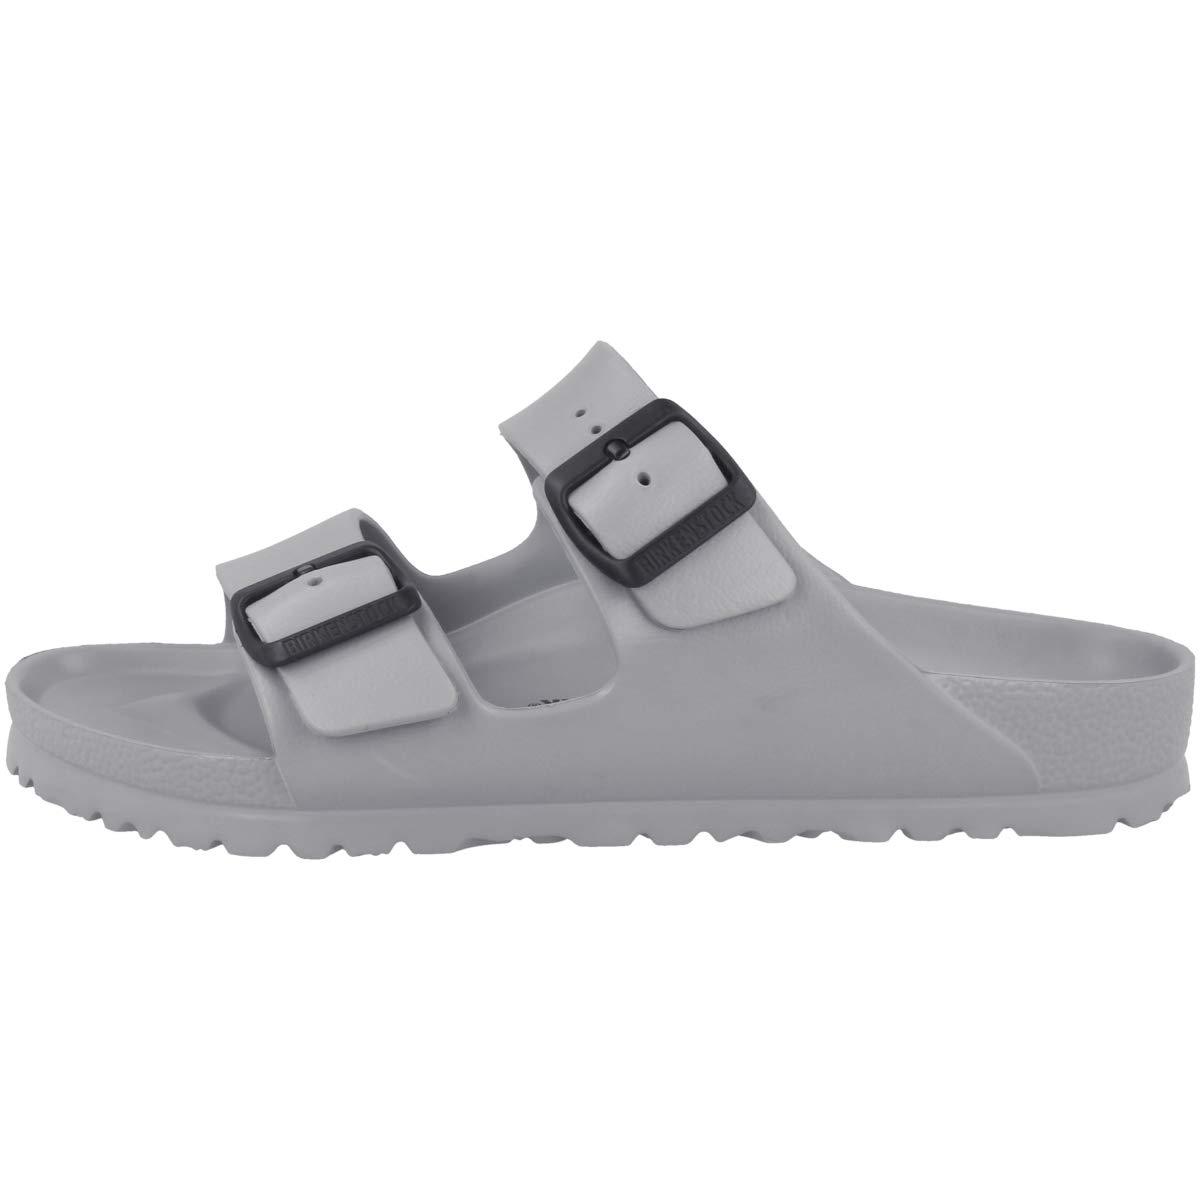 000a524a92fd8 Birkenstock Arizona, Unisex Adults' Sandals